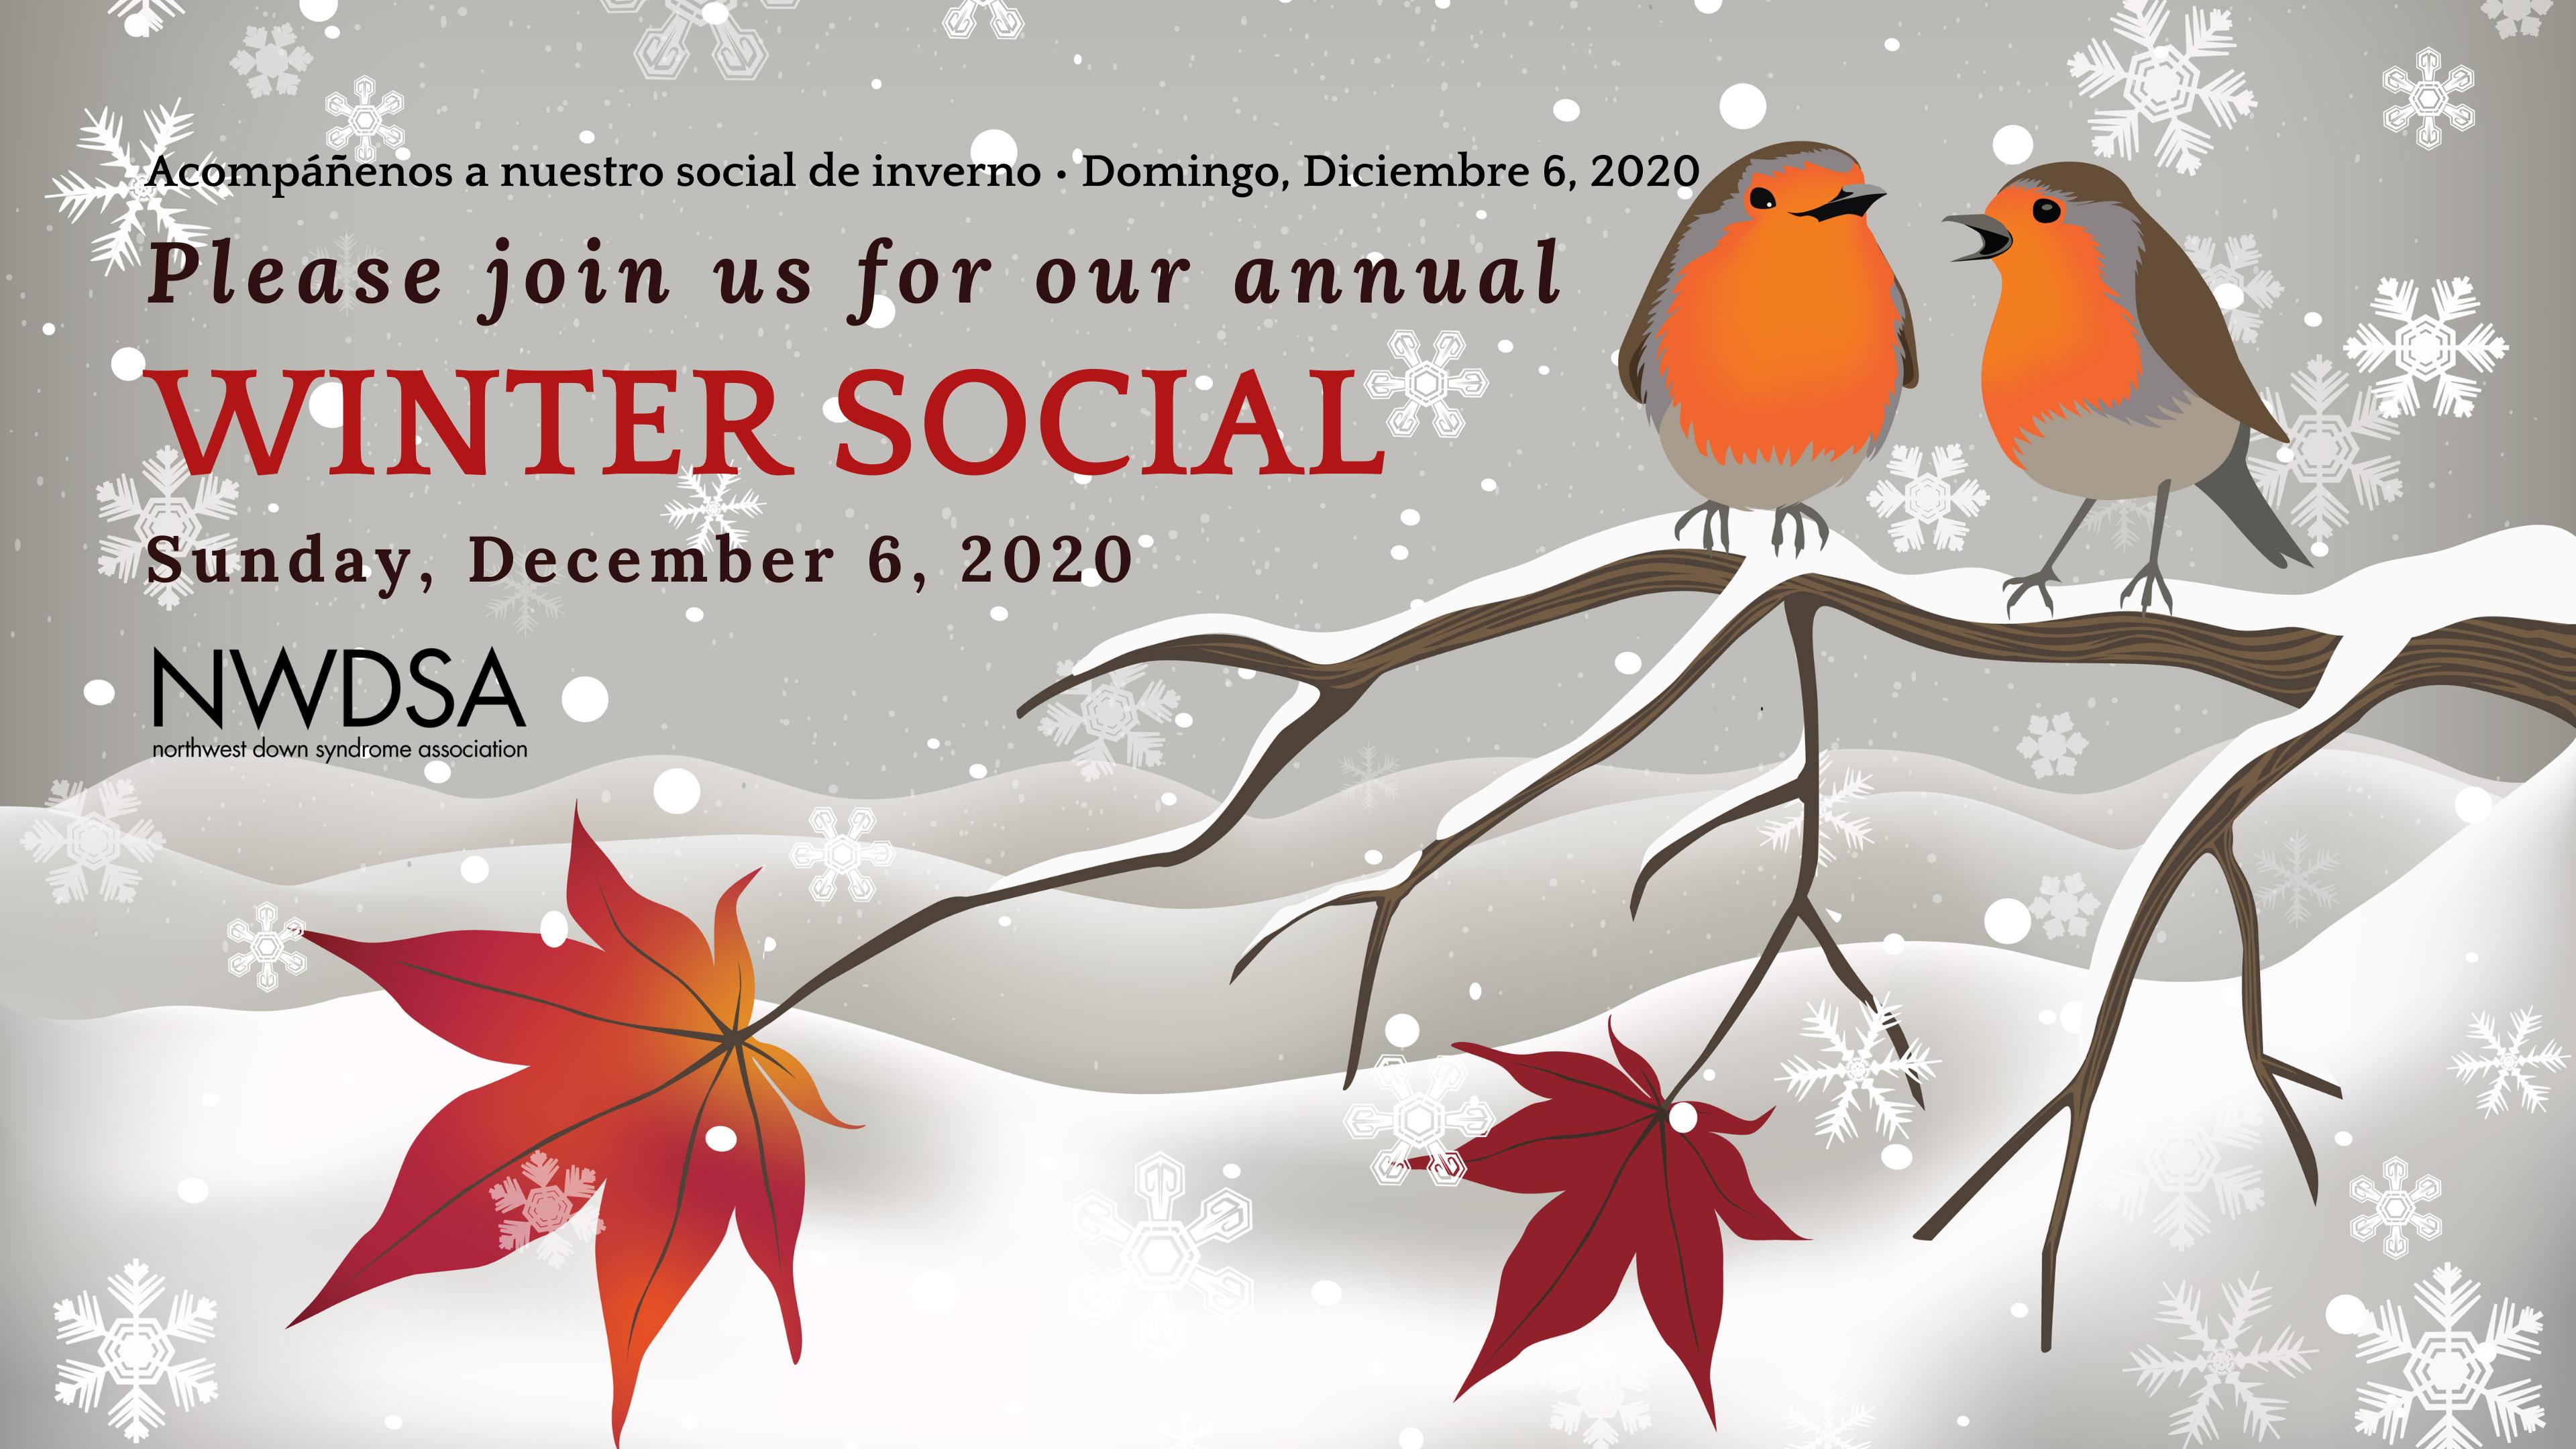 NWDSA Winter Social / Social de Inverno